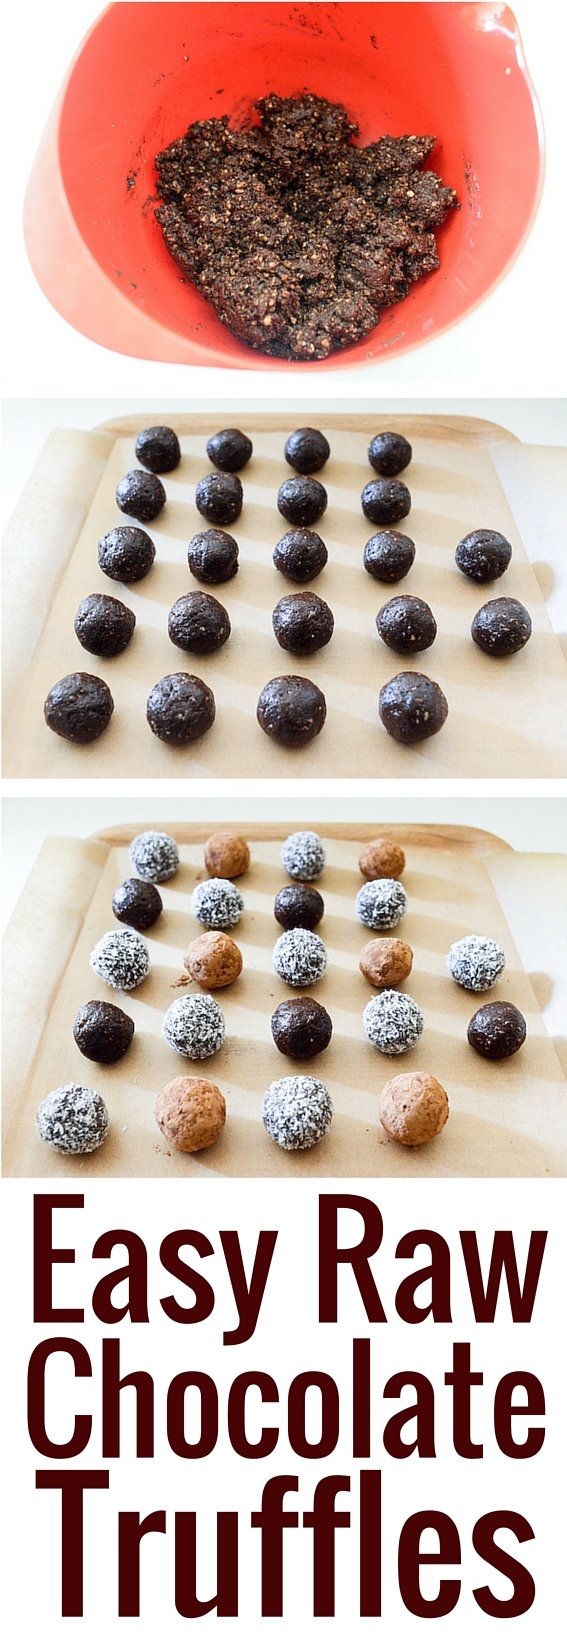 Easy Raw Chocolate Truffles